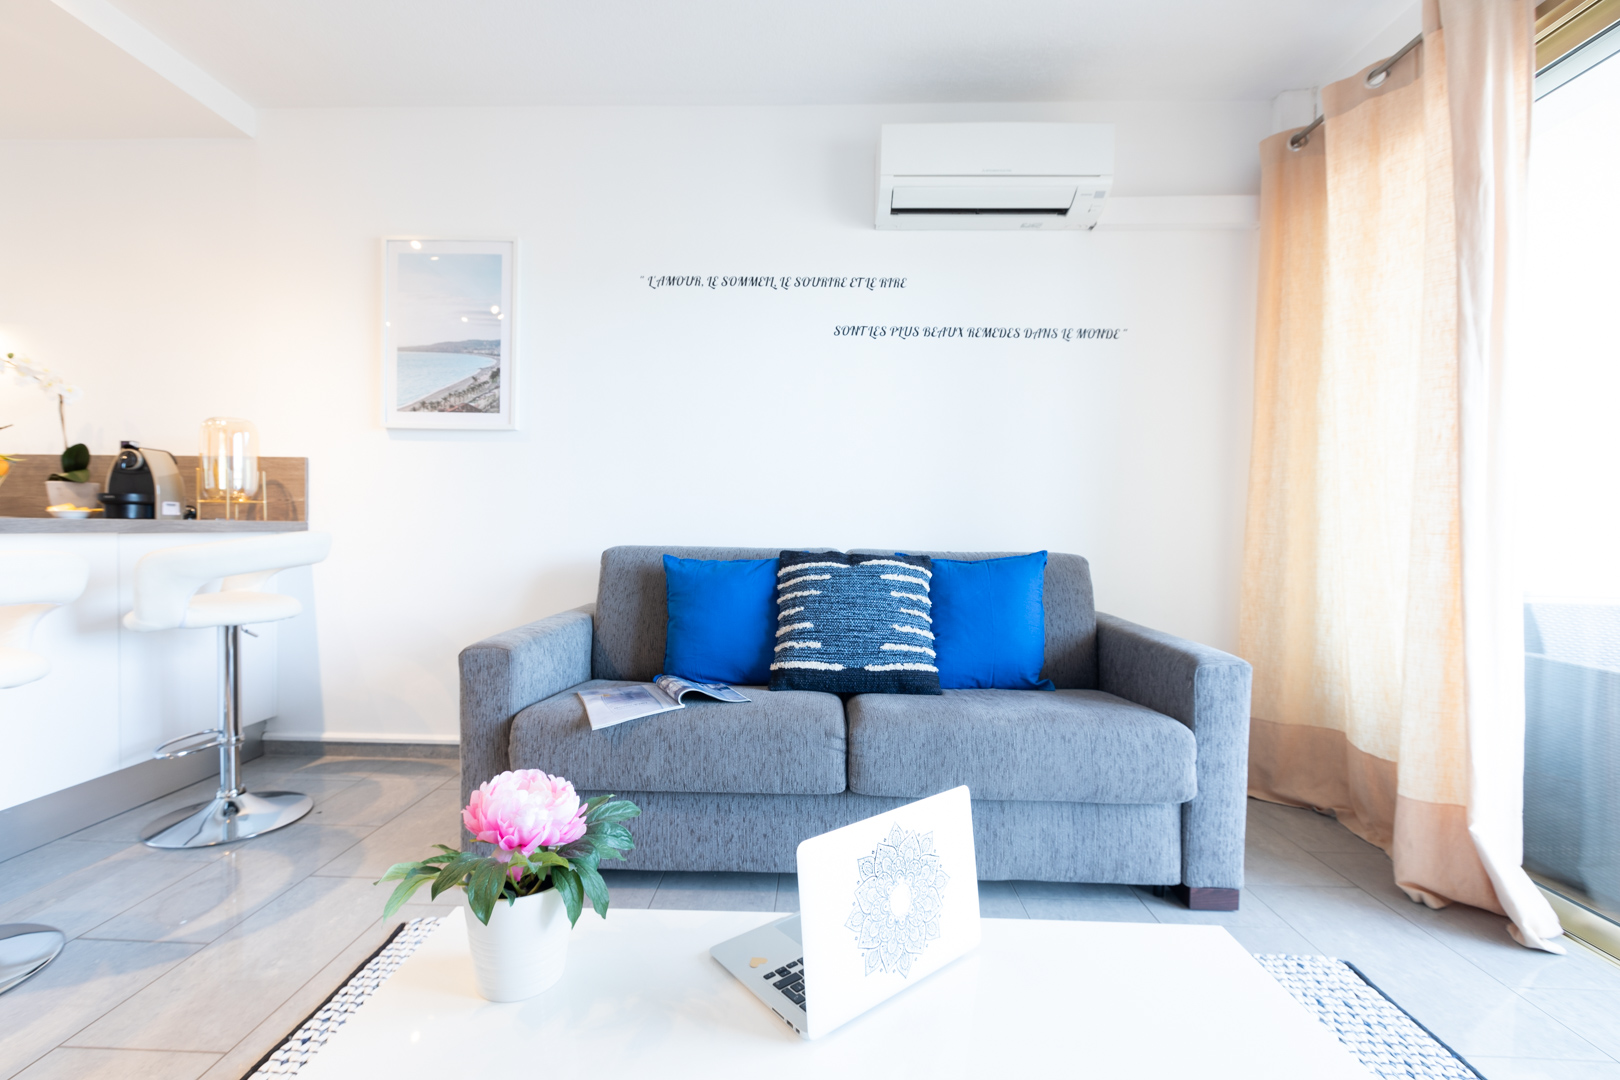 Sofa at Sky View Terrace Apartment